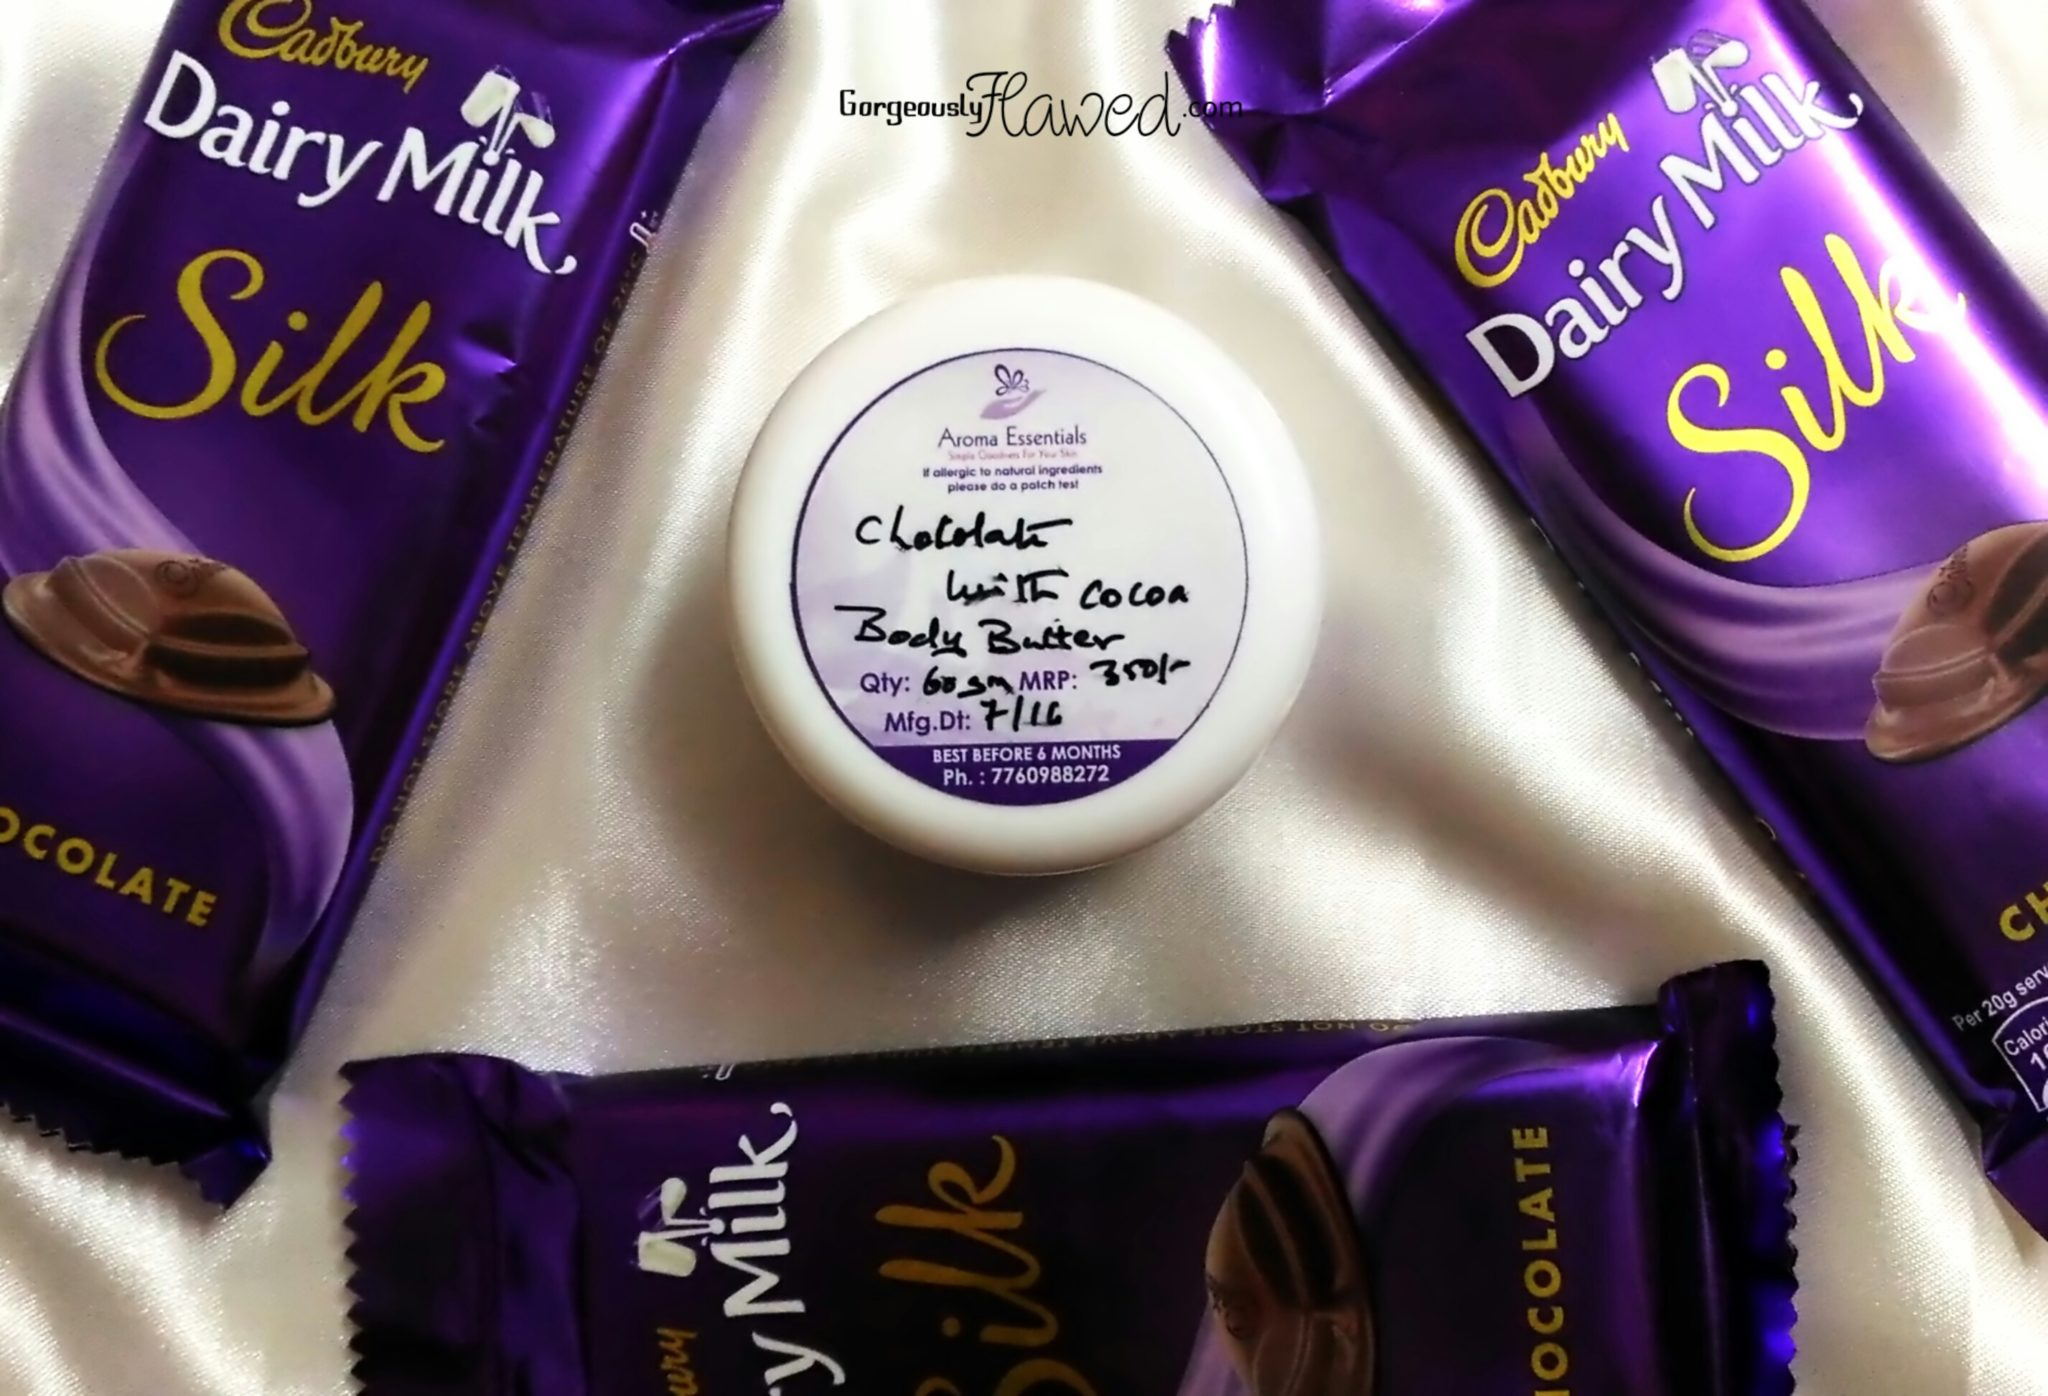 Aroma Essentials Chocolate Cocoa Body Butter